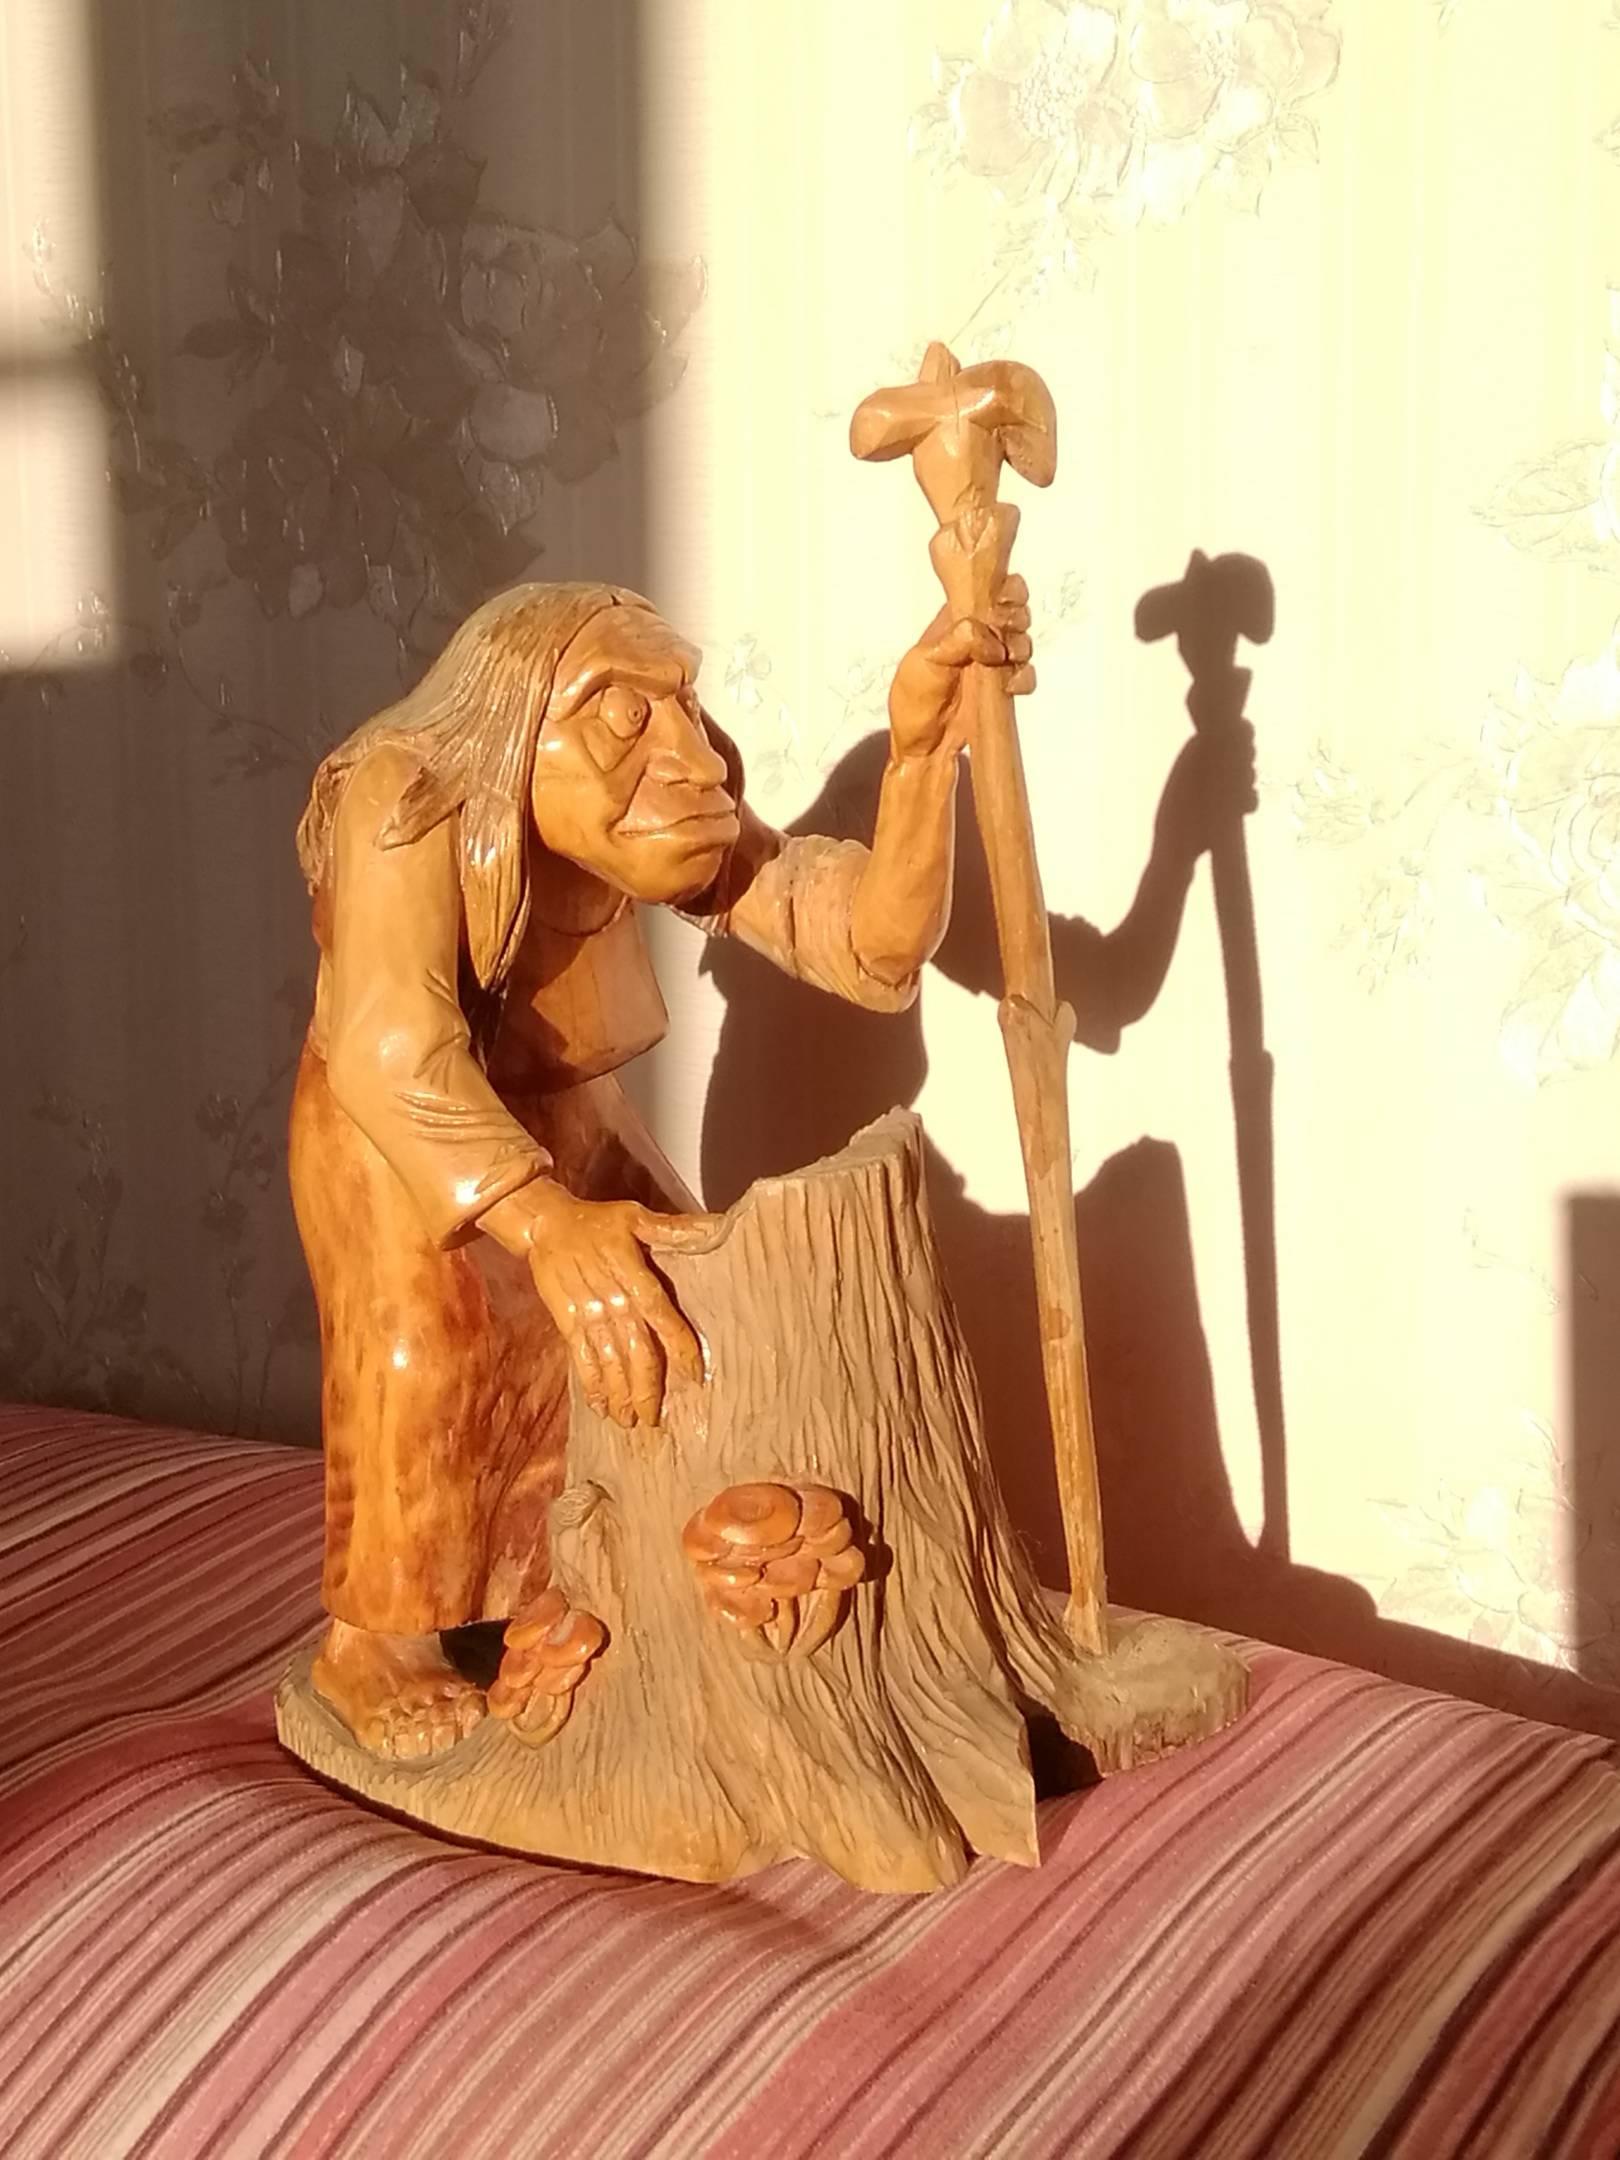 Скульптура малой формы